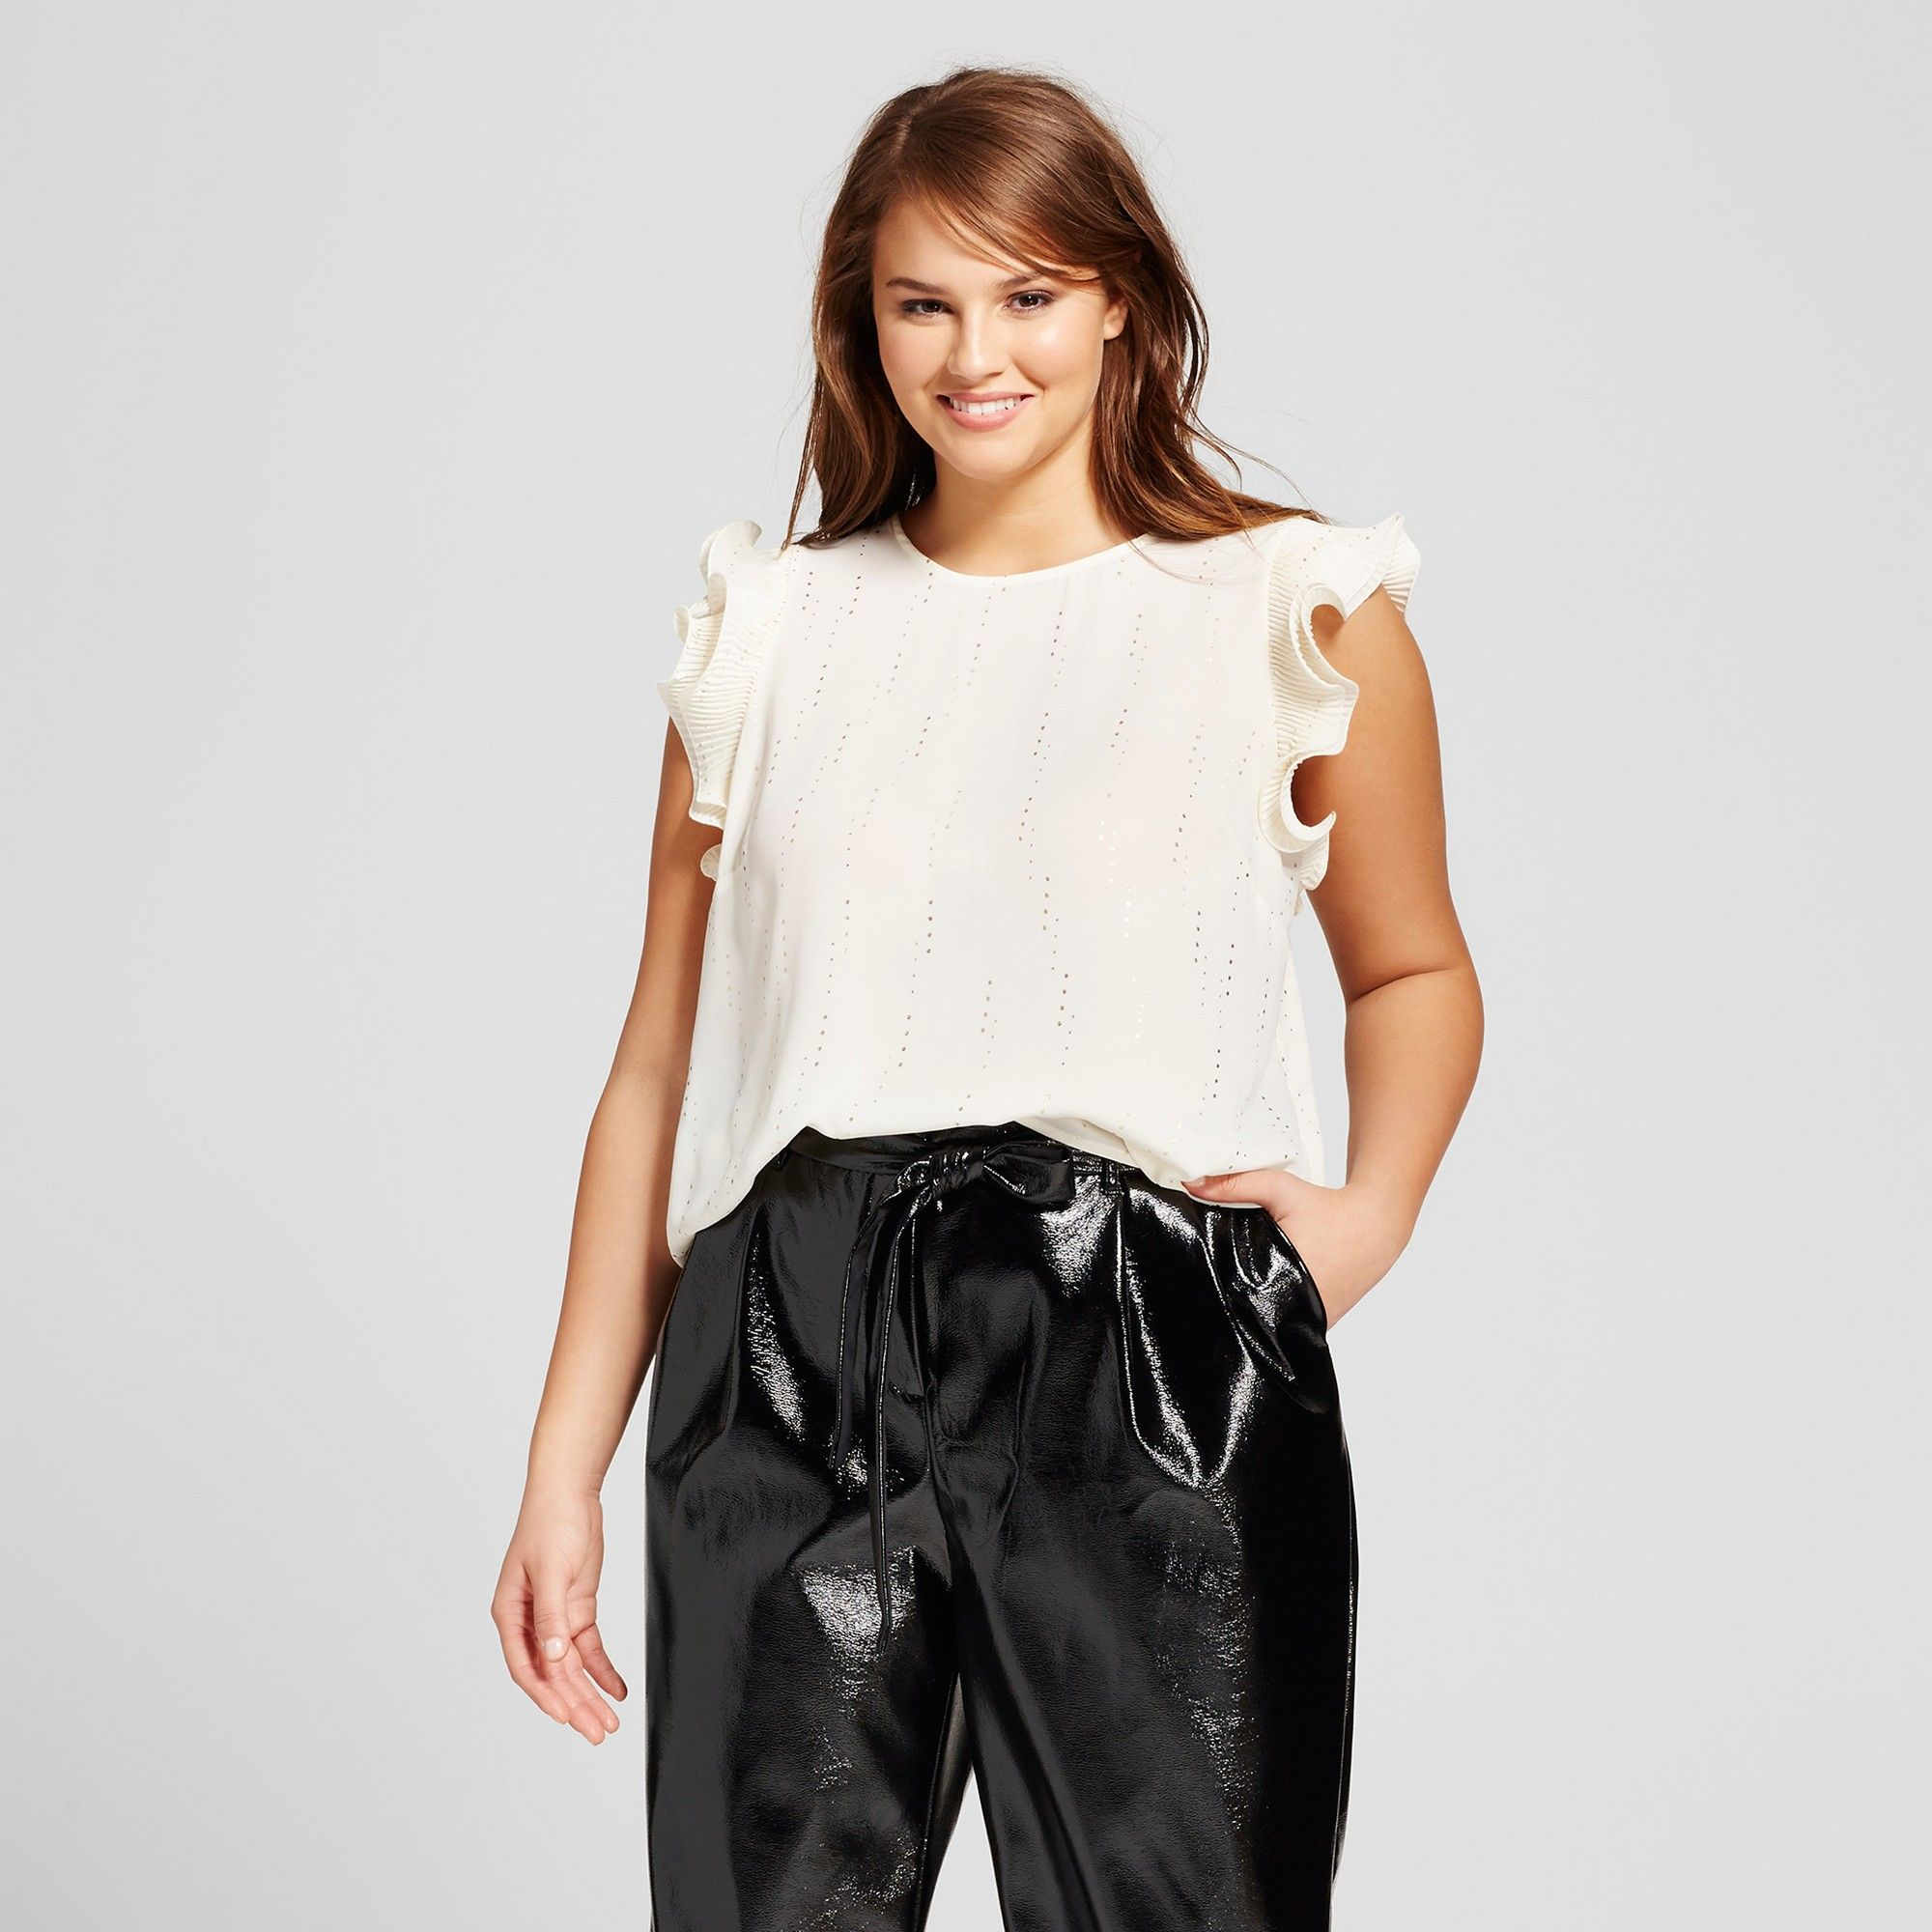 3d40e2fc35b16 Women s Plus Size Short Sleeve Metallic Frilled Tank Top - Who What Wear  White Gold Polka Dot 1X